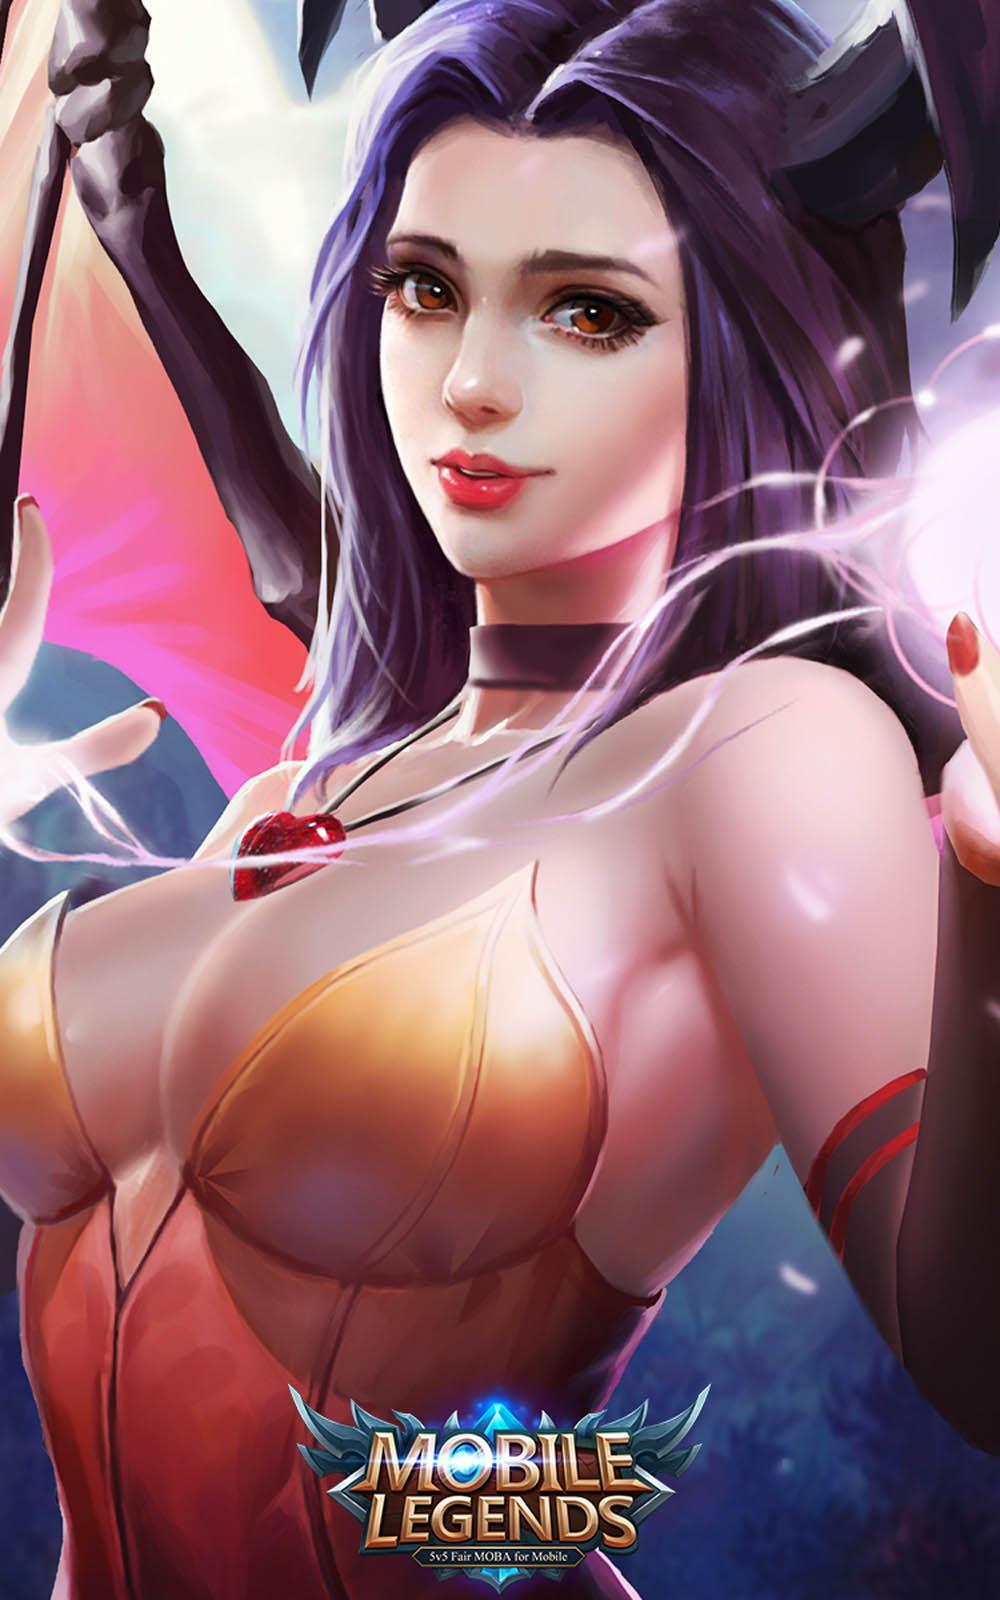 Alice Mobile Legends Hero 4k Ultra Hd Mobile Wallpaper